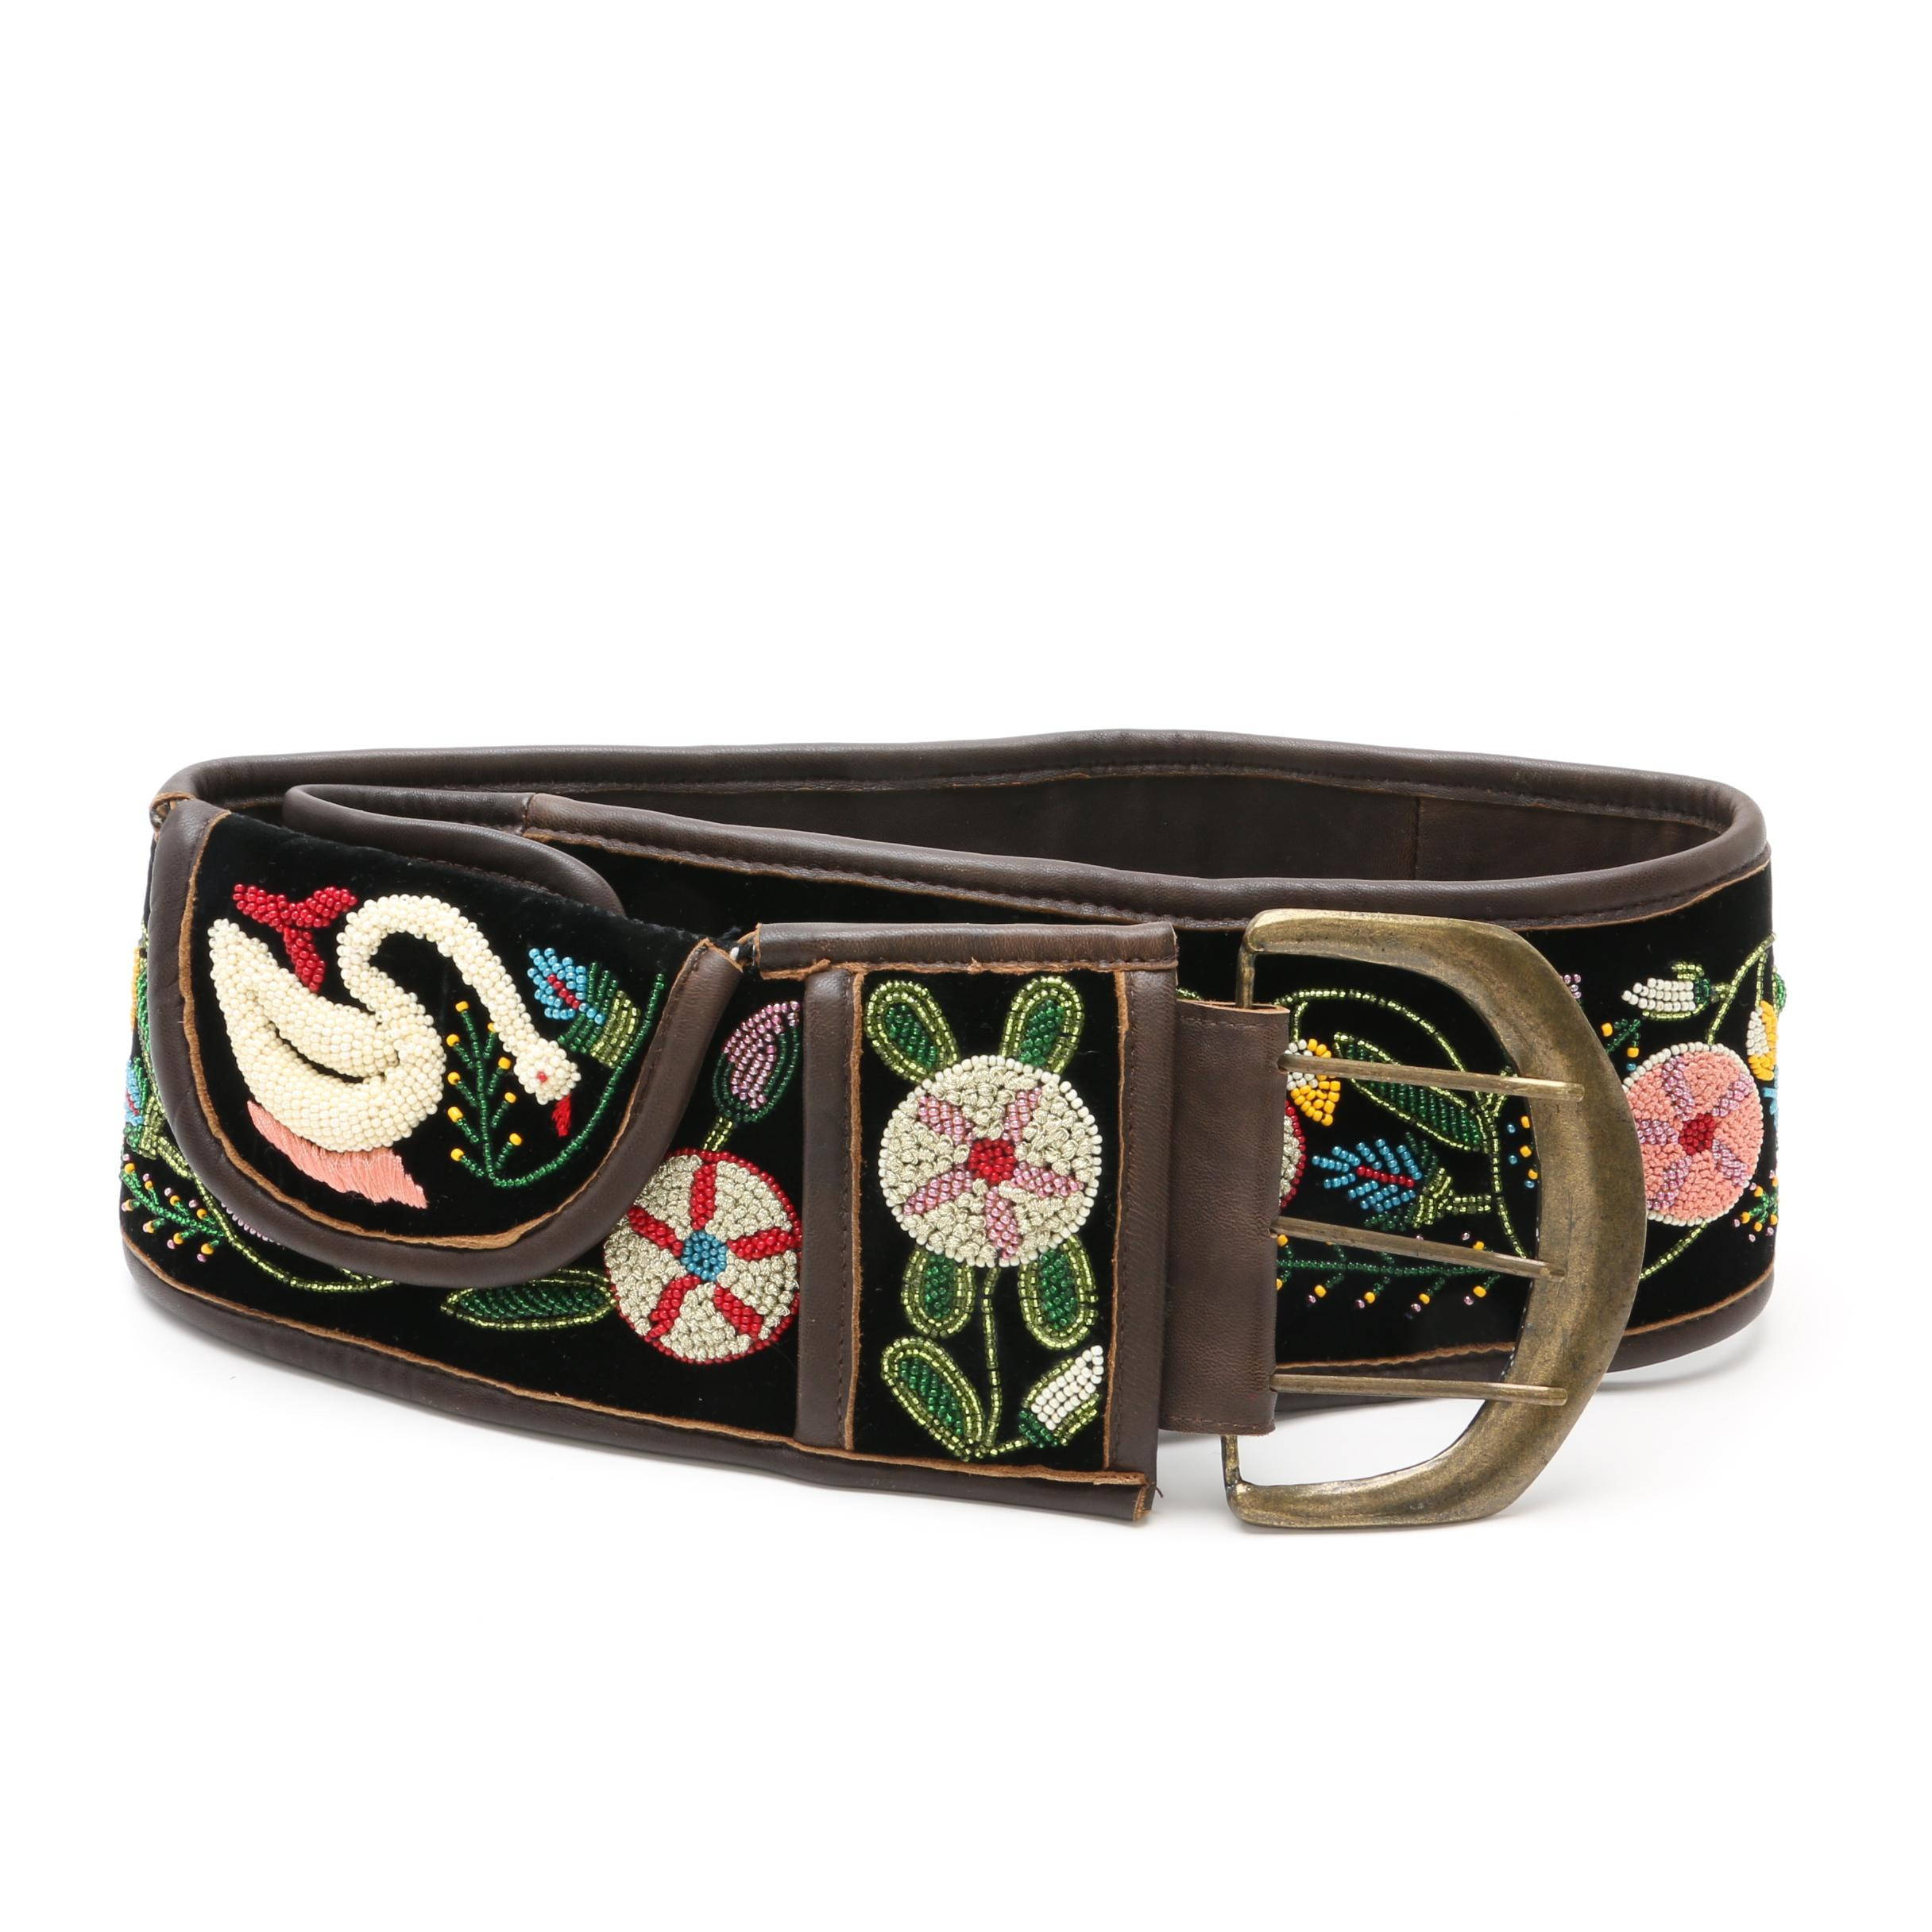 Double D Ranch of Yoakum, Texas Leather and Velvet Beaded Belt